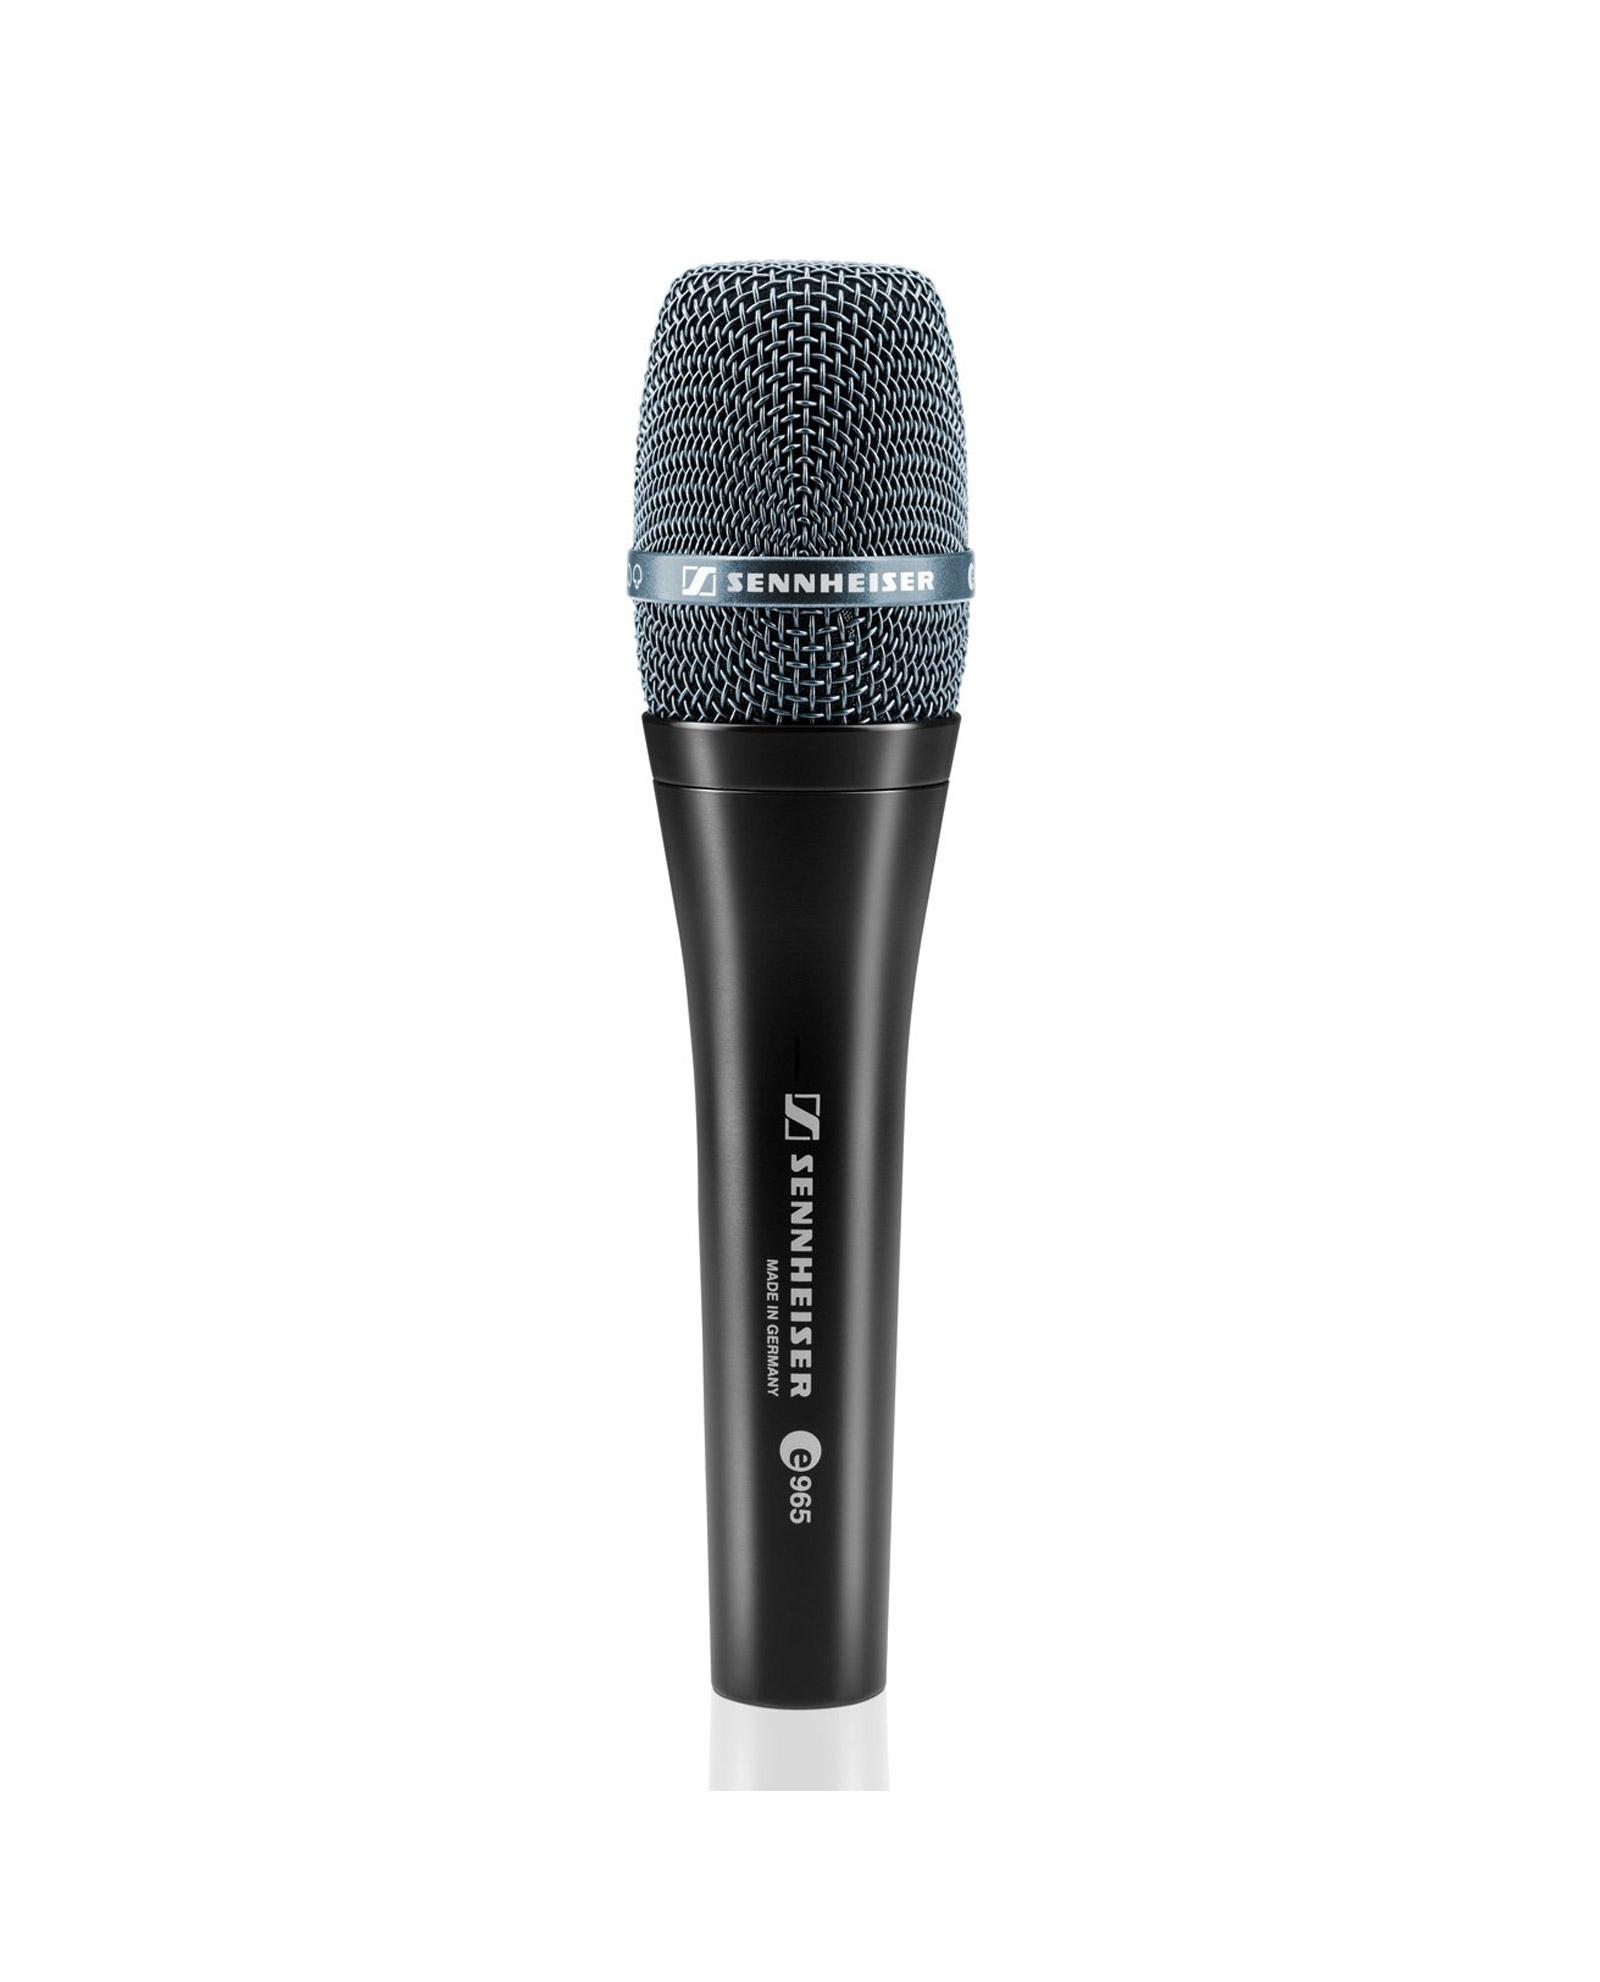 Sennheiser E 965 Vocal Condenser Microphone